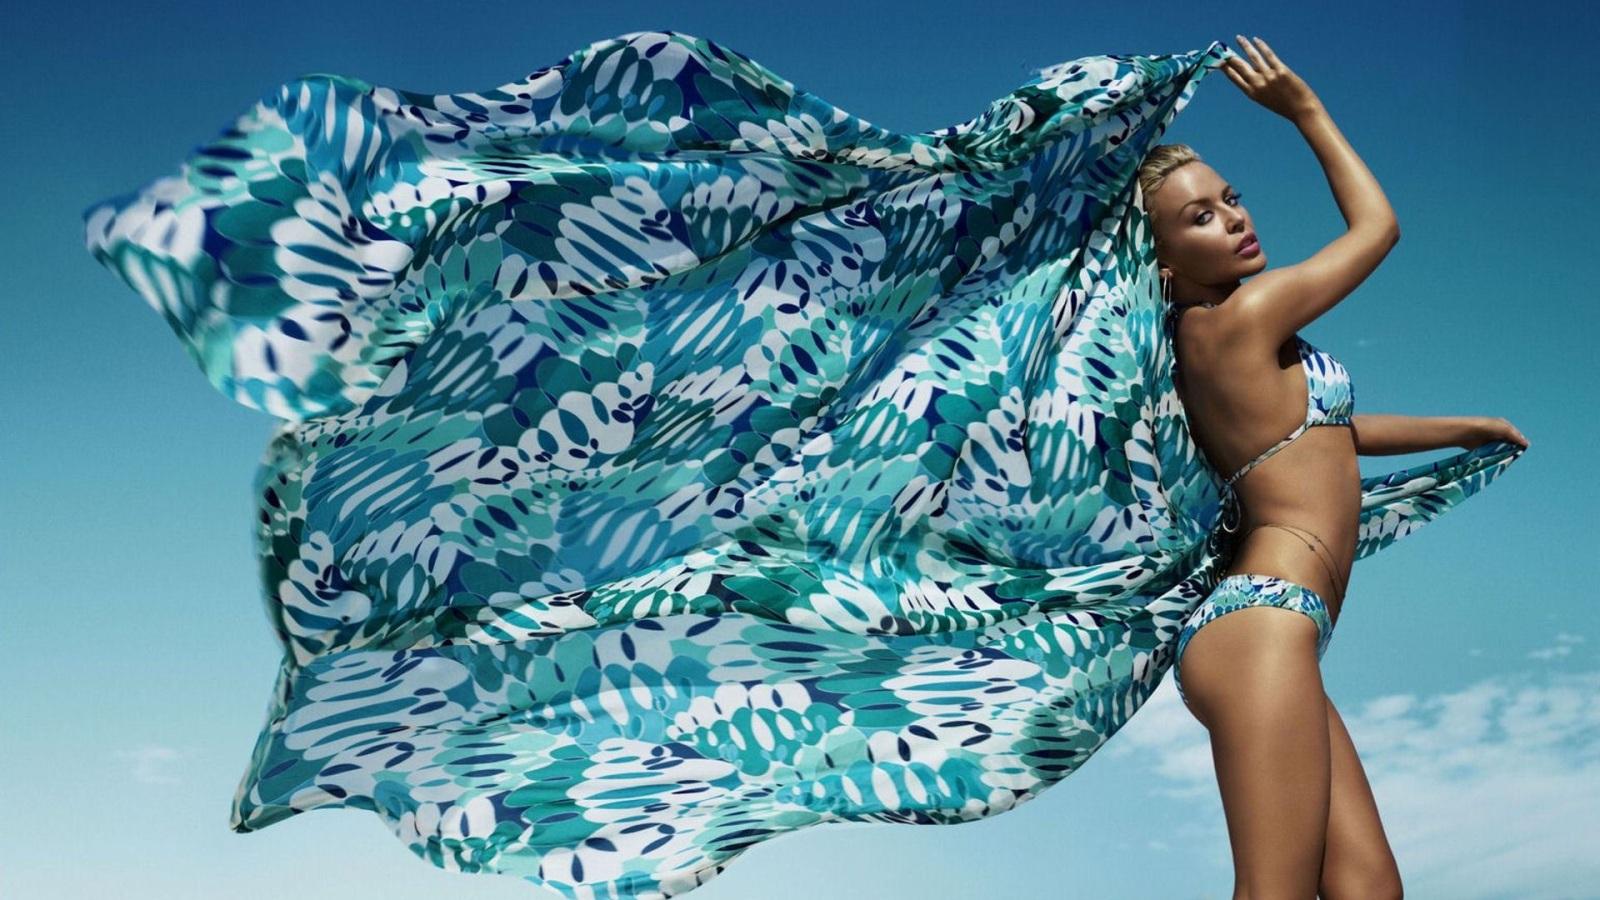 http://4.bp.blogspot.com/-U8GK9SgC1cY/UA_HPv2MsxI/AAAAAAAAAm0/2LWQO4JmDPI/s1600/desktop-celebrity-babe-hot-bikini-wallpapers-hd-sexy-bikini-wallpaper-kylie-minogue-grey-silver-bikini-hotmoviepictures-com+(2).jpg